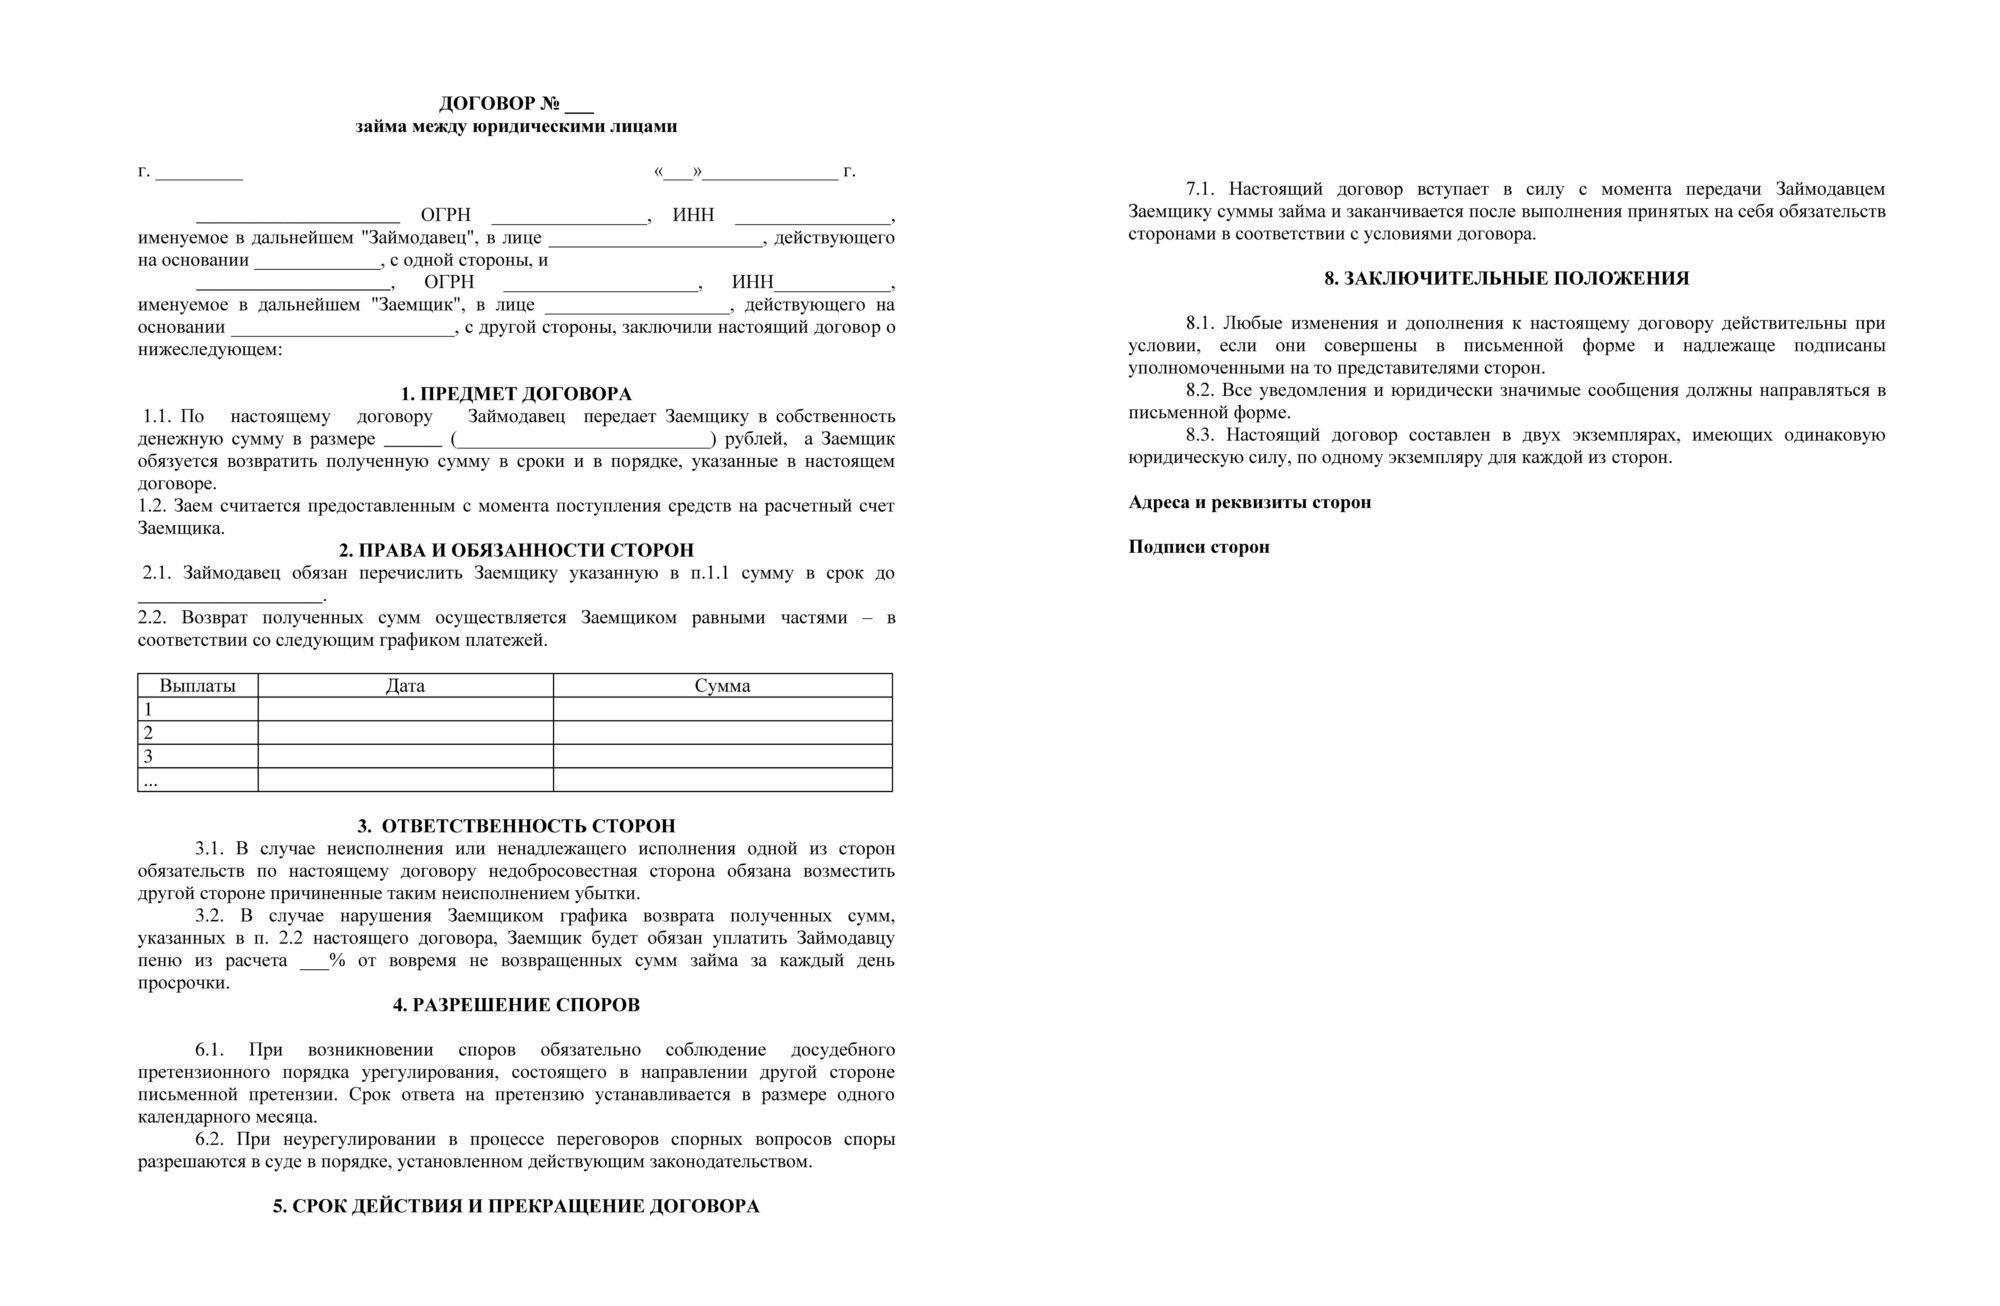 договор займа между юр лицами бланк